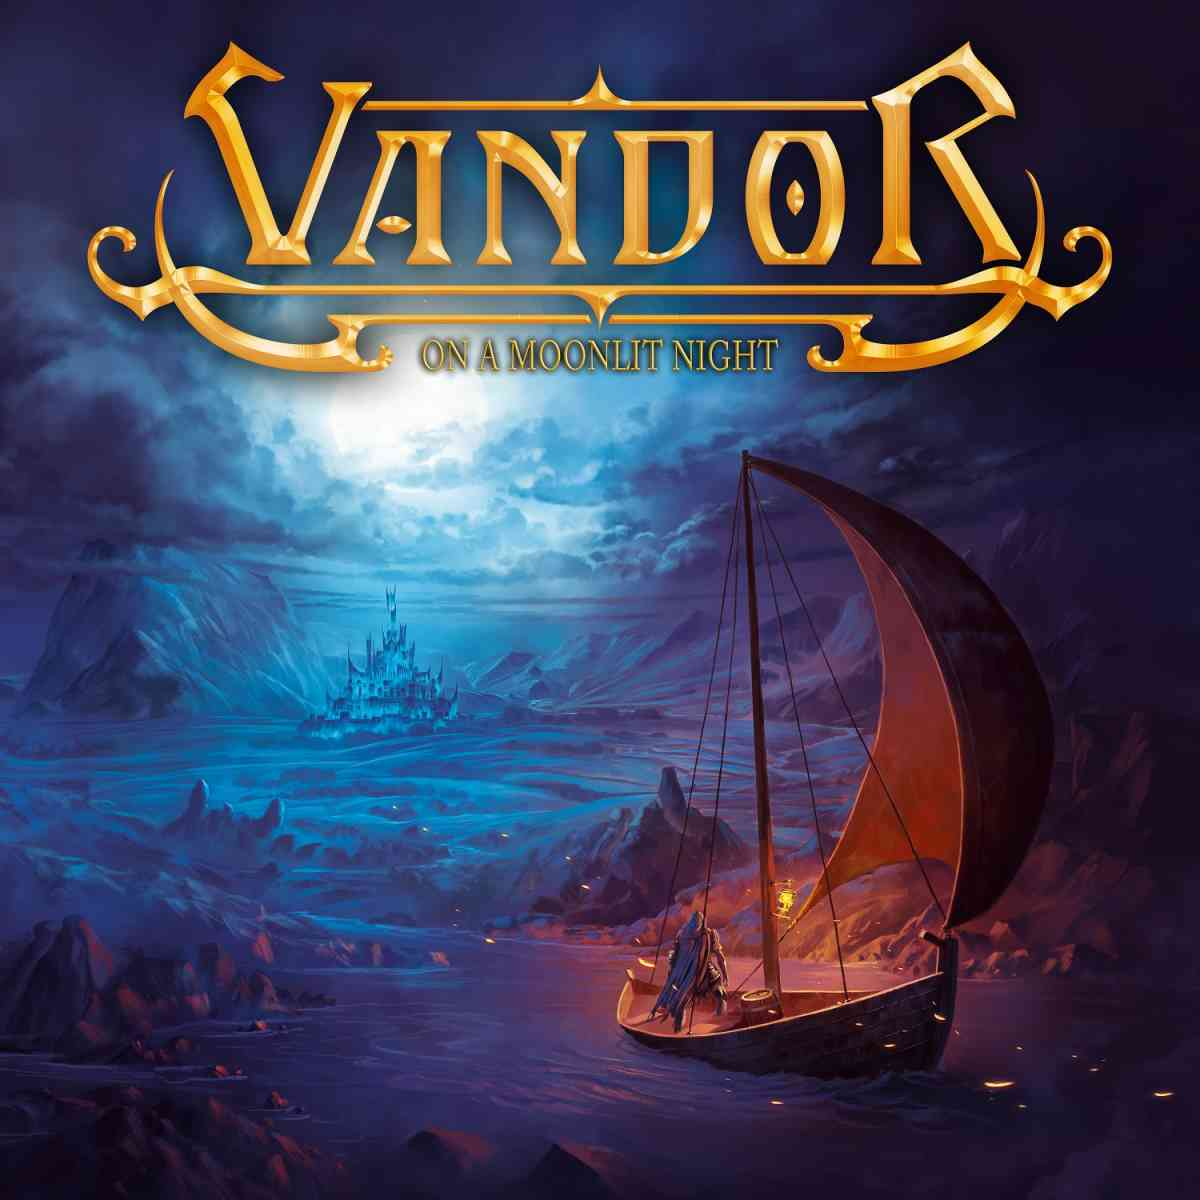 Vandord - On A Moonlit Night - album cover